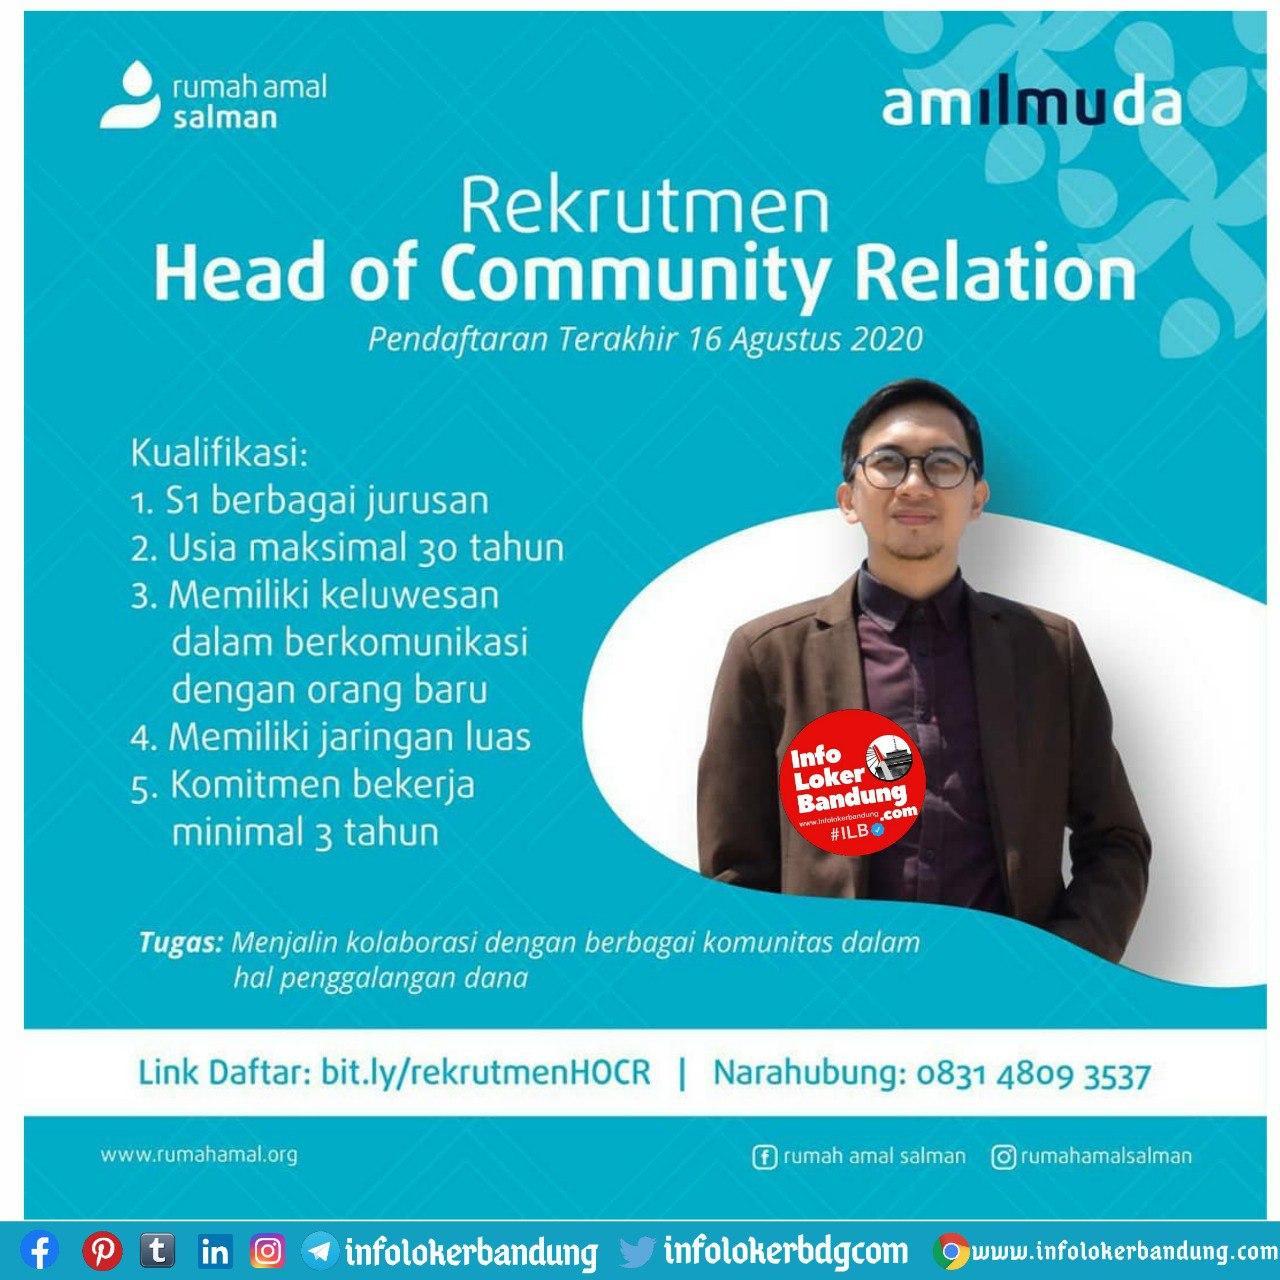 Lowongan Kerja Rumah Amal Salman Bandung Agustus 2020 ...